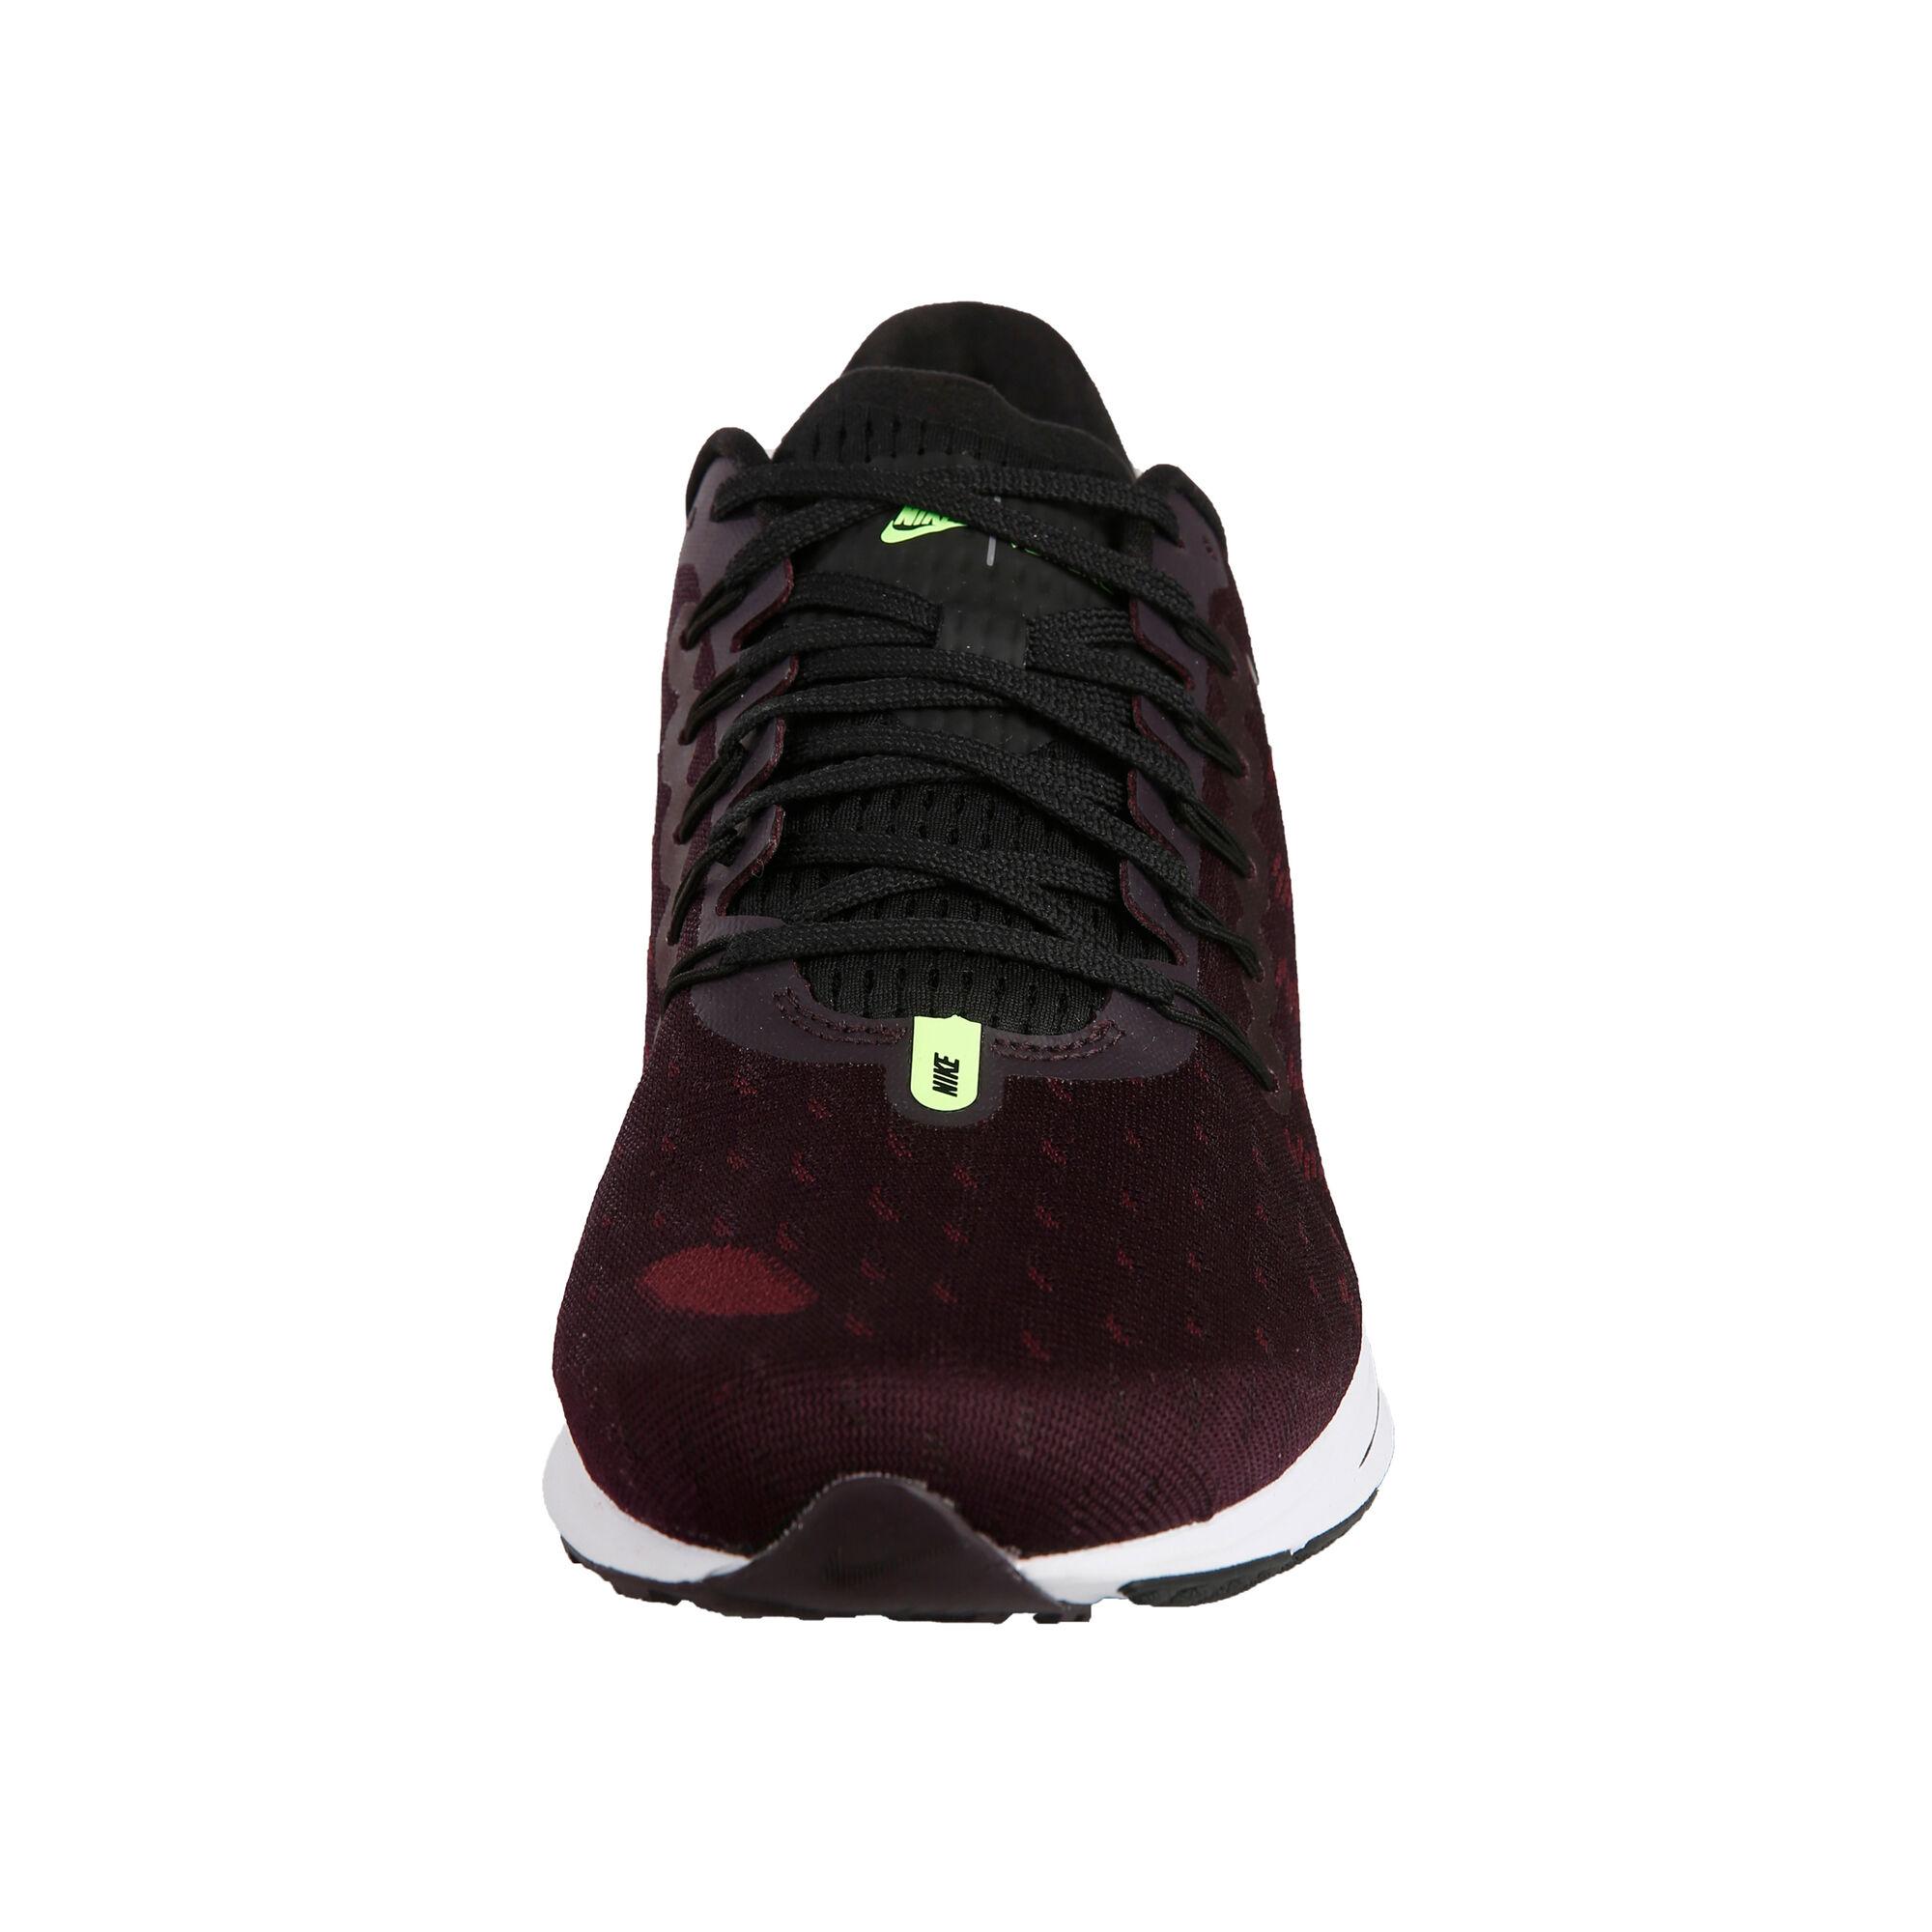 cheap for discount ddeab 8b63d ... Nike · Nike · Nike · Nike. Air Zoom Vomero ...